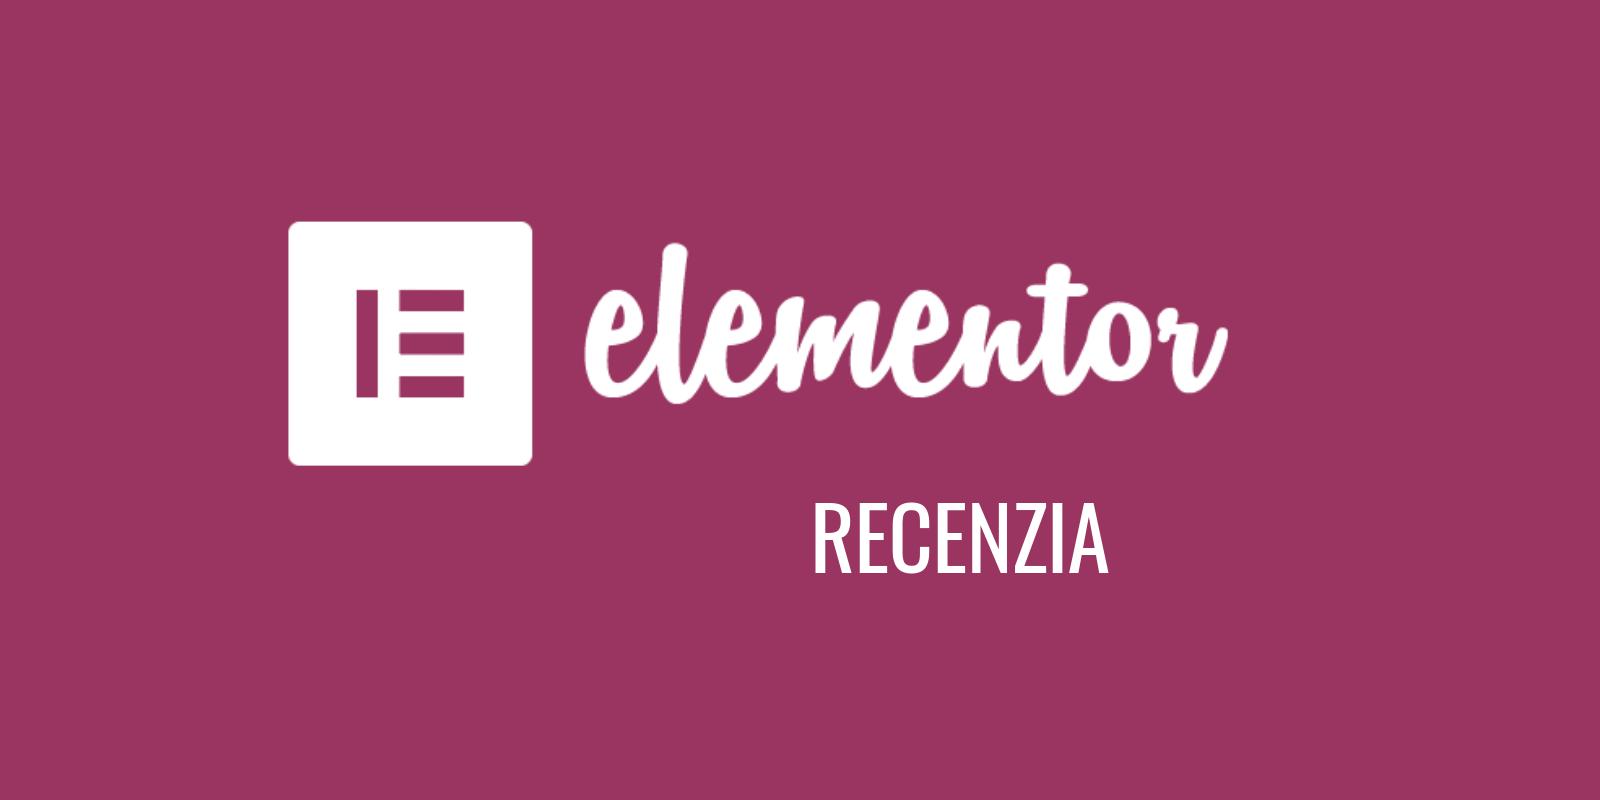 Elementor - recenzia tohto obľúbeného WordPress builderu